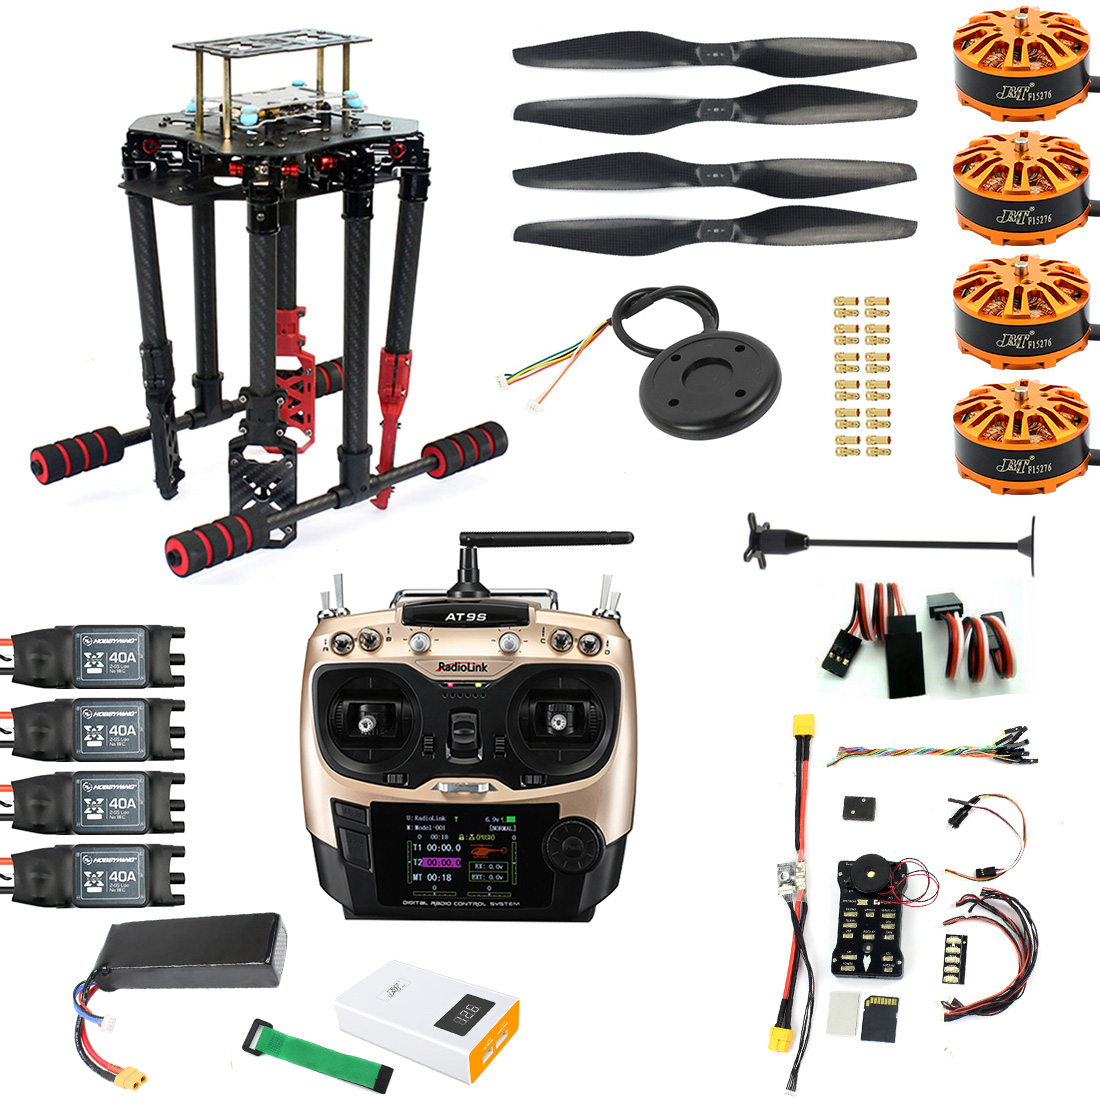 DIY GPS Drone 2 4Ghz AT9S X4 560mm Umbrella Foldable FPV Quadcopter 4-Axis  ARF PIXHAWK Flight Control Unassemble